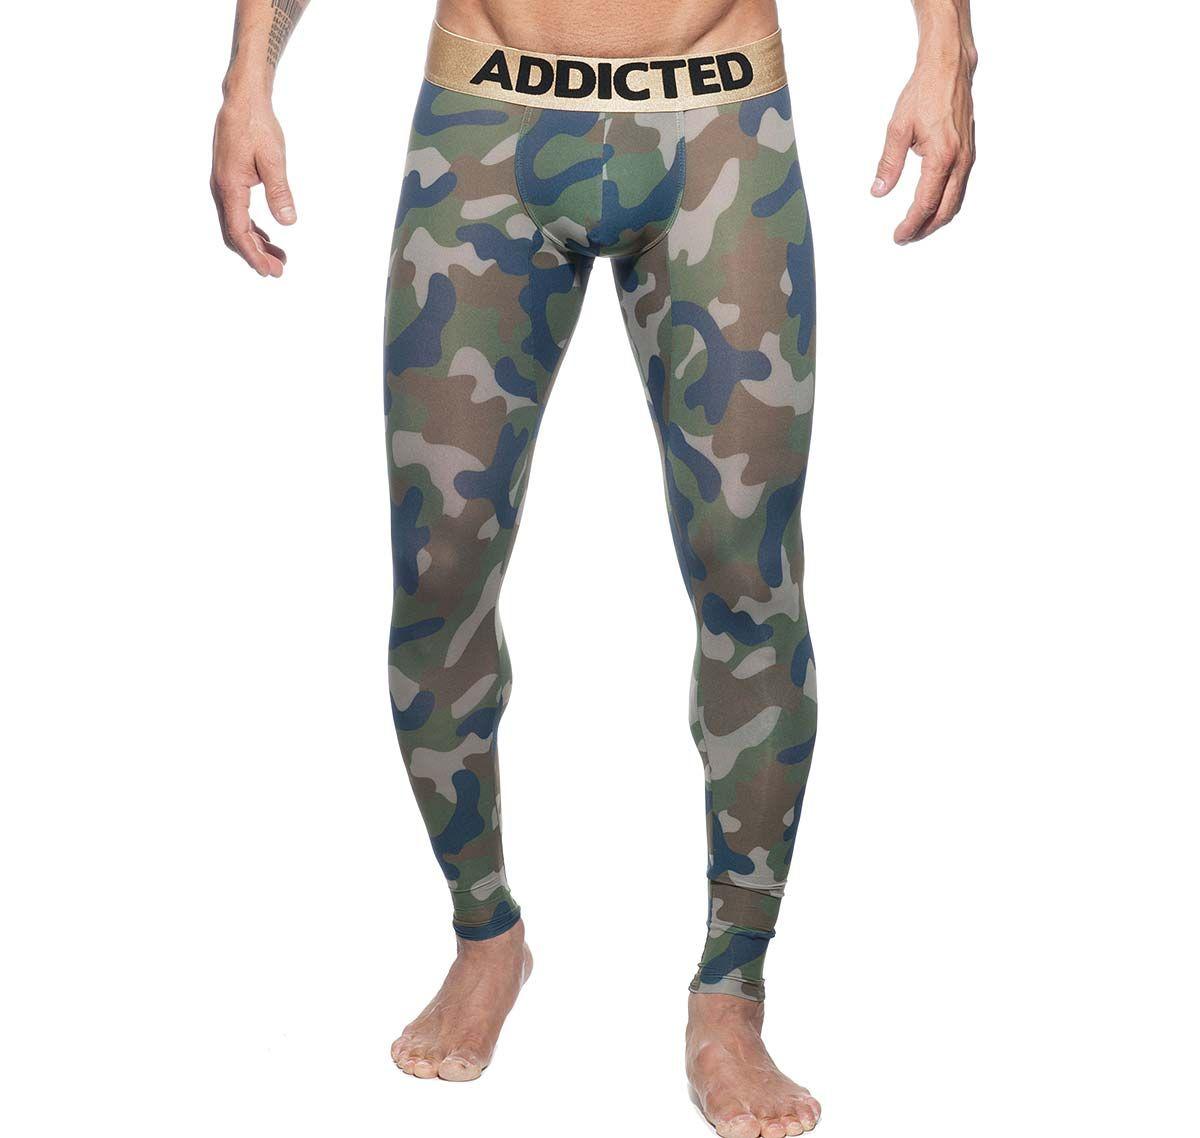 Addicted lange Unterhose CAMO LONG JOHN AD694, camouflage